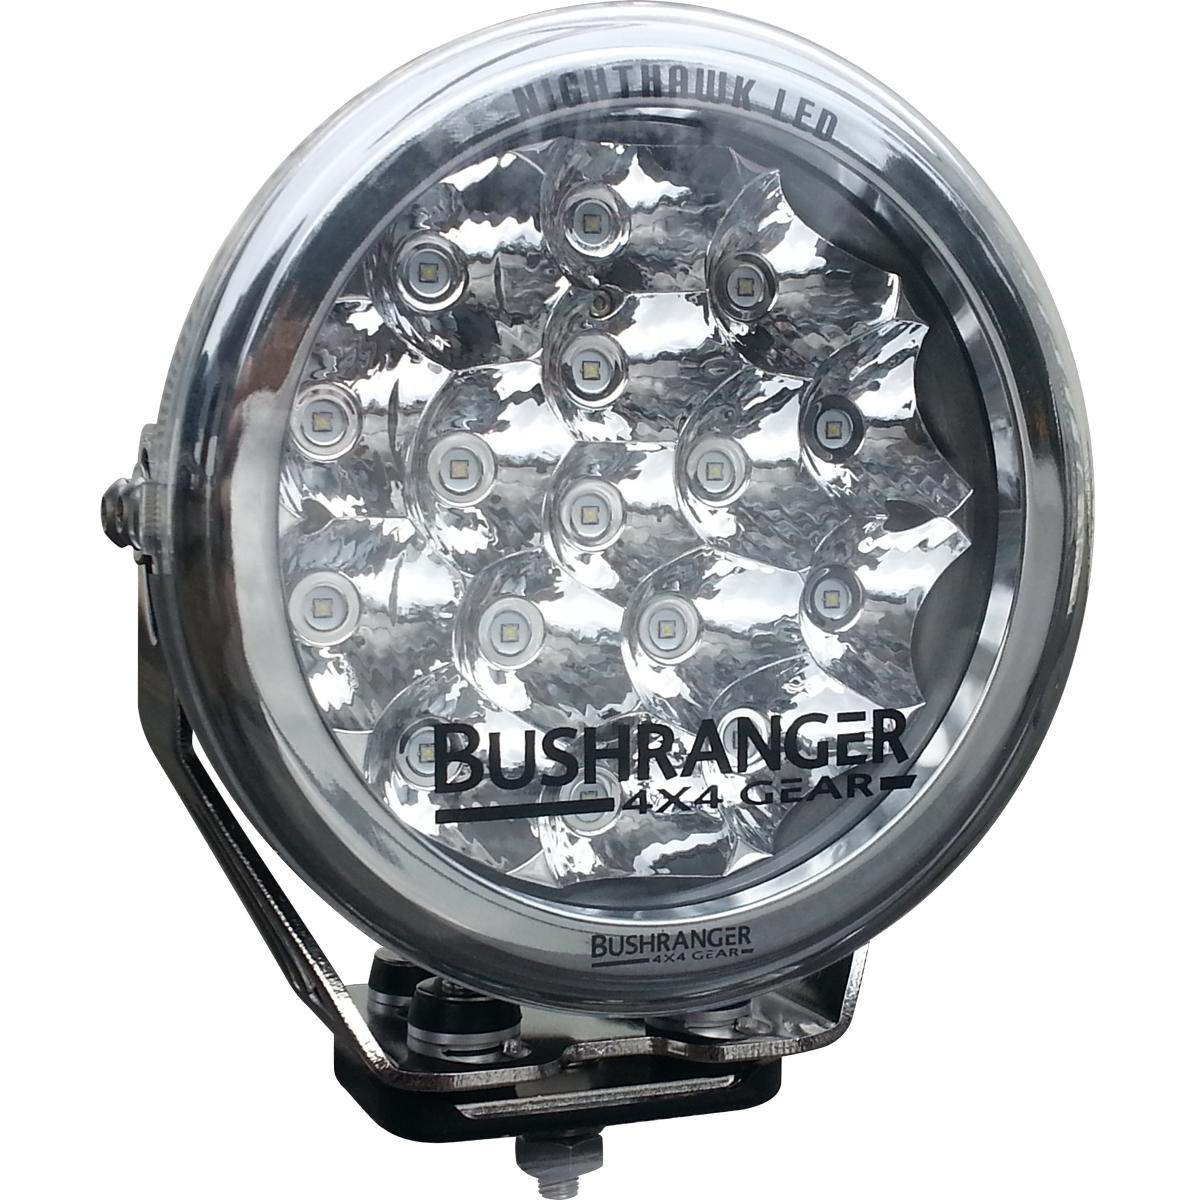 nighthawk led spotlight off road equipment. Black Bedroom Furniture Sets. Home Design Ideas